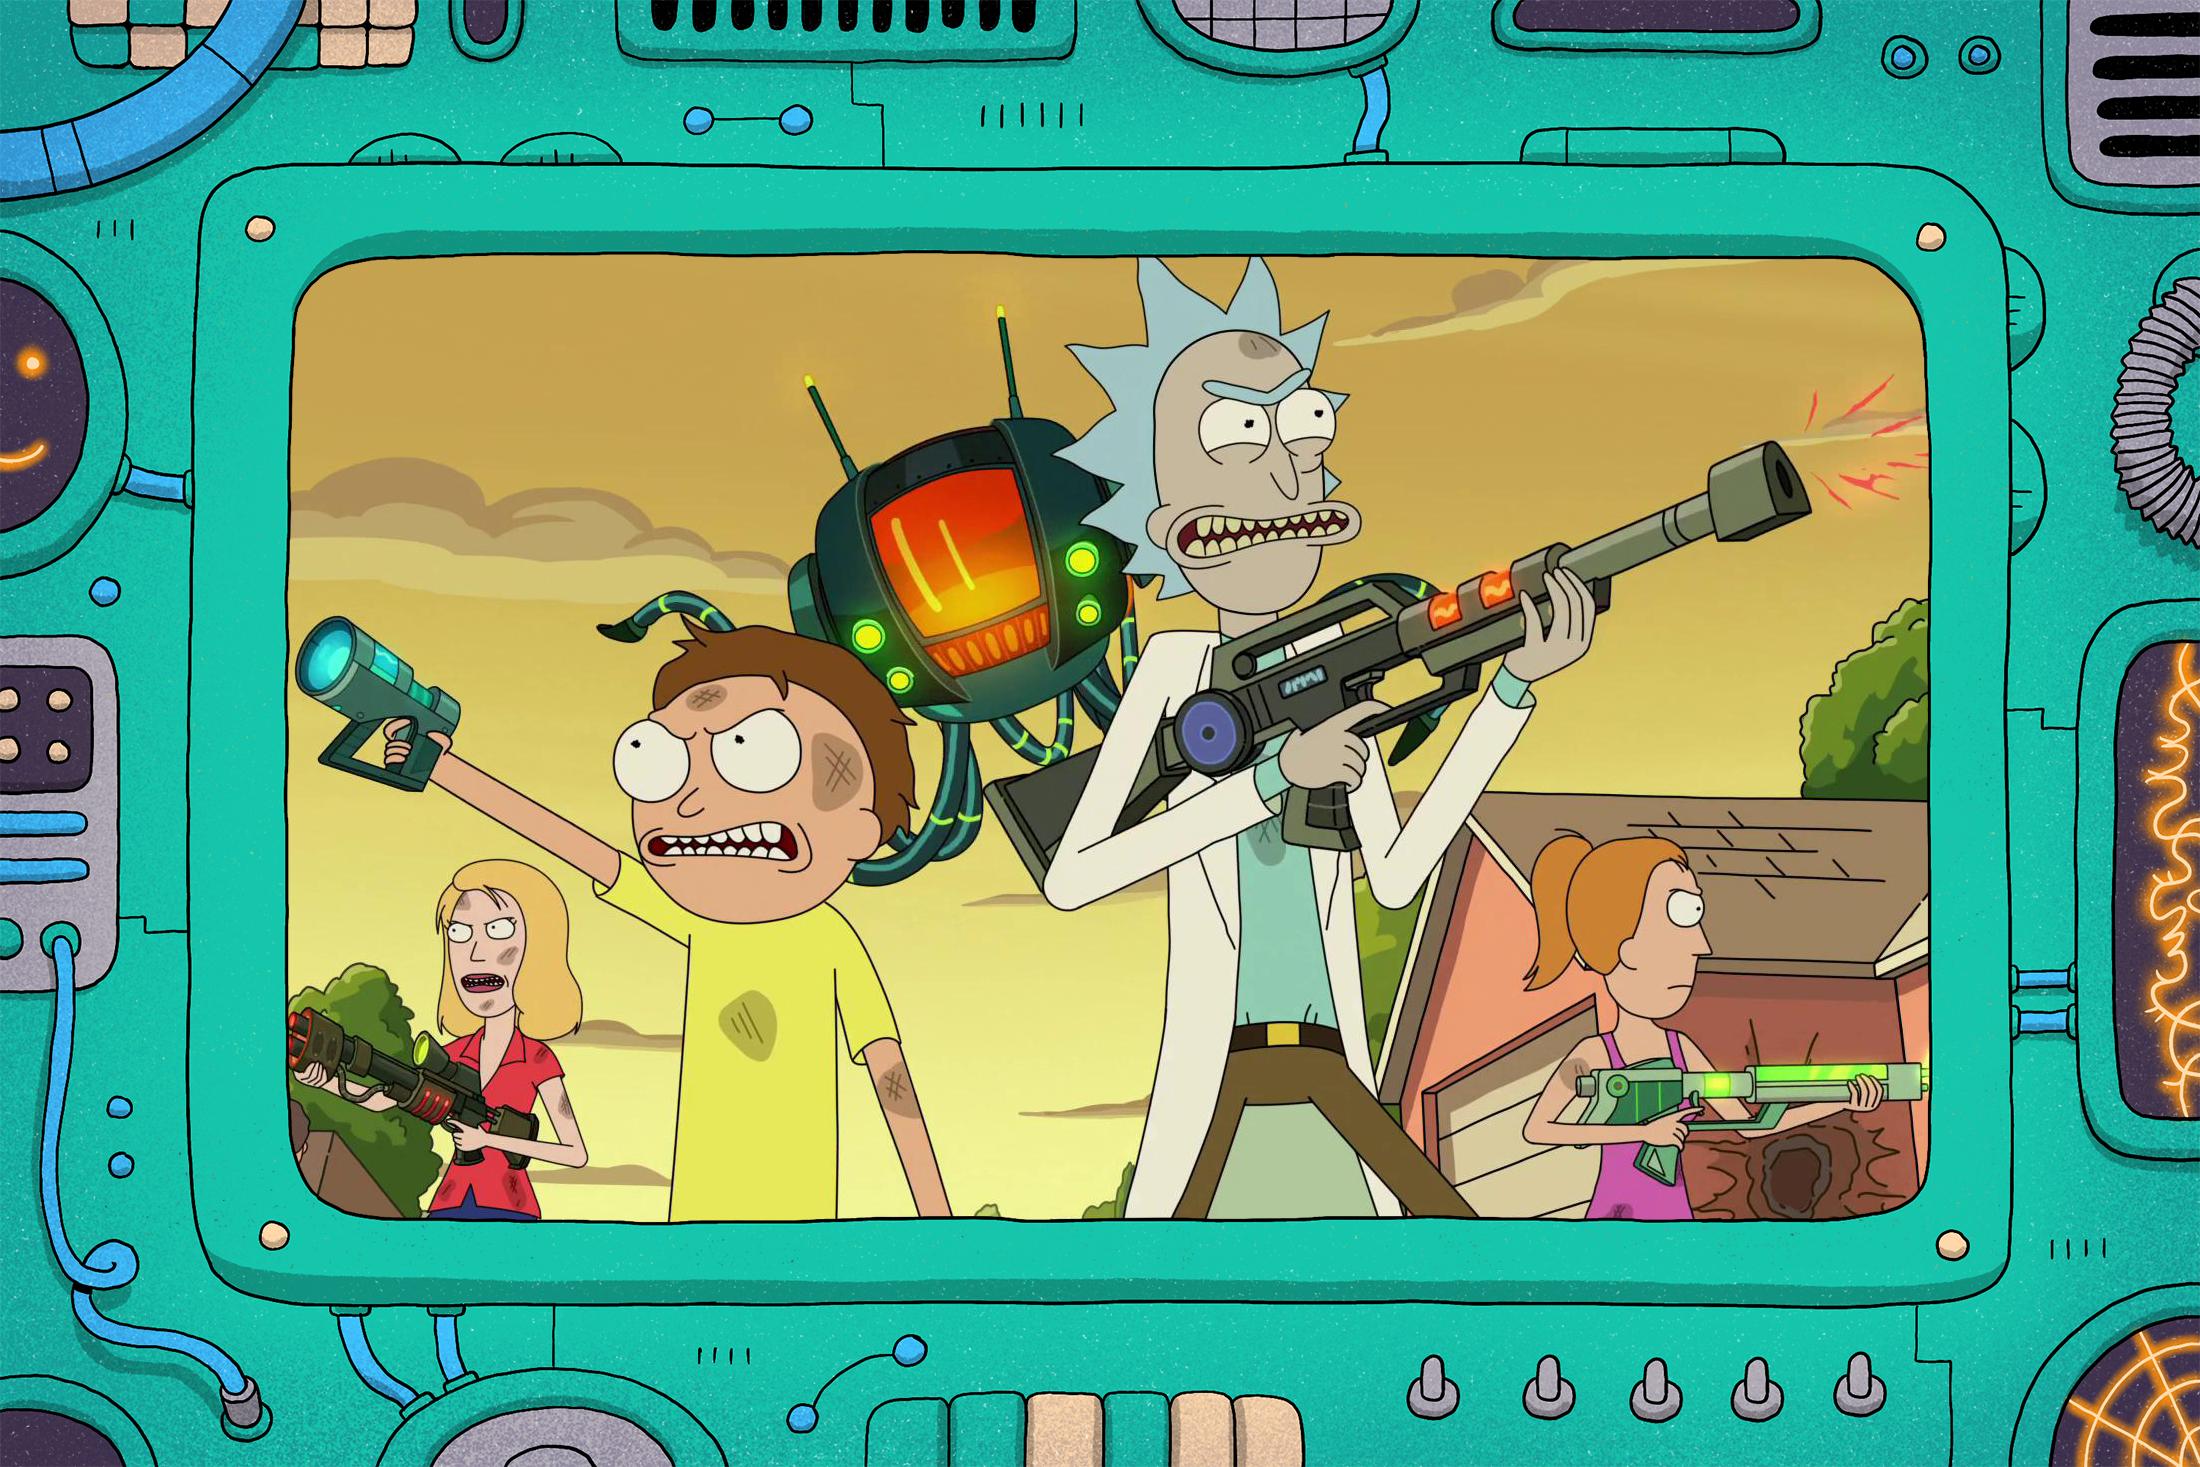 rick and morty firing guns in season 5